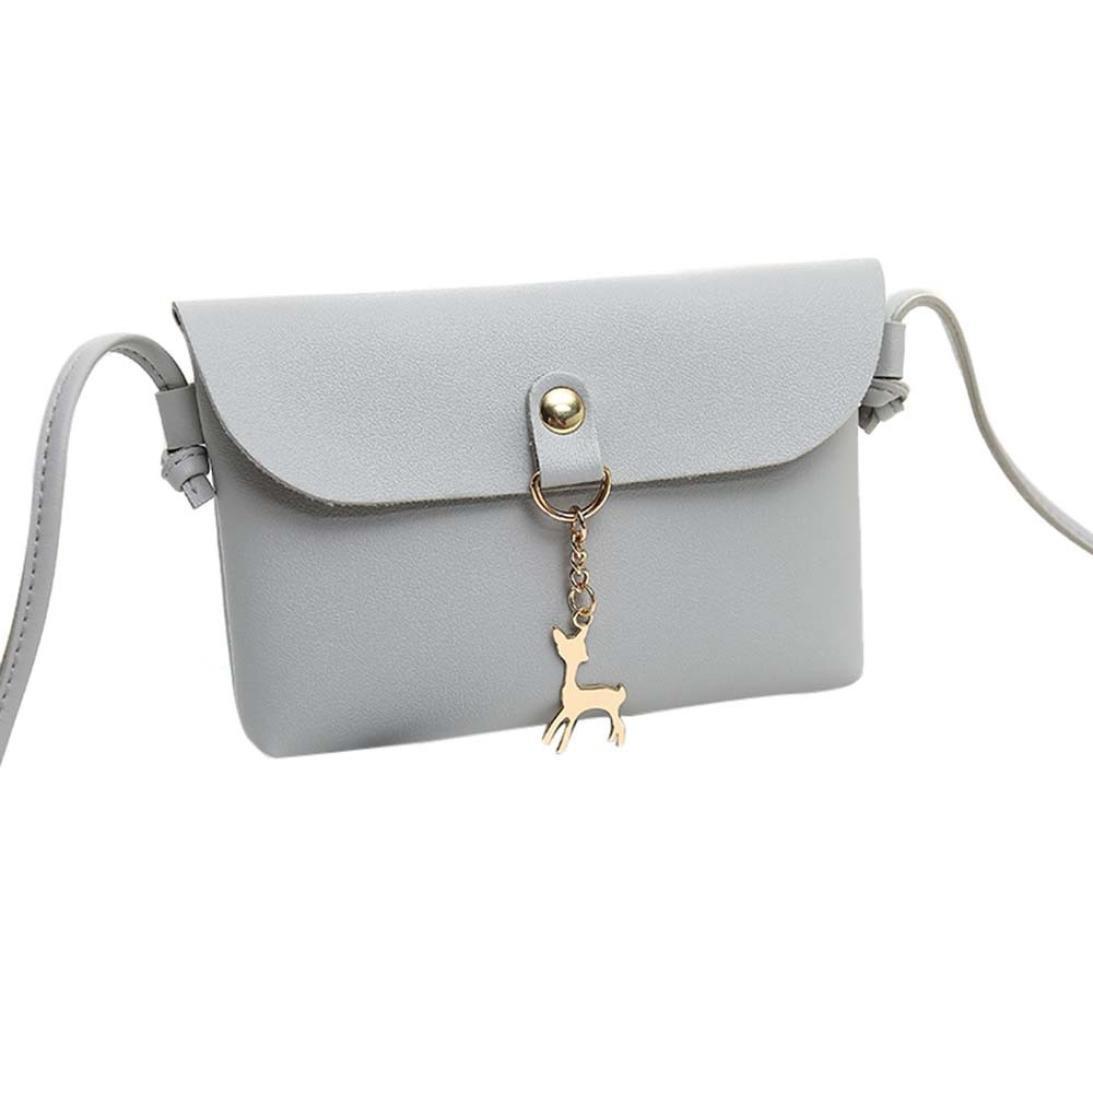 ZYooh Clearance Sale Wallet Bag Girls Vintage Small Deer Pendant Leather Crossbody Shoulder Bag (Gray)